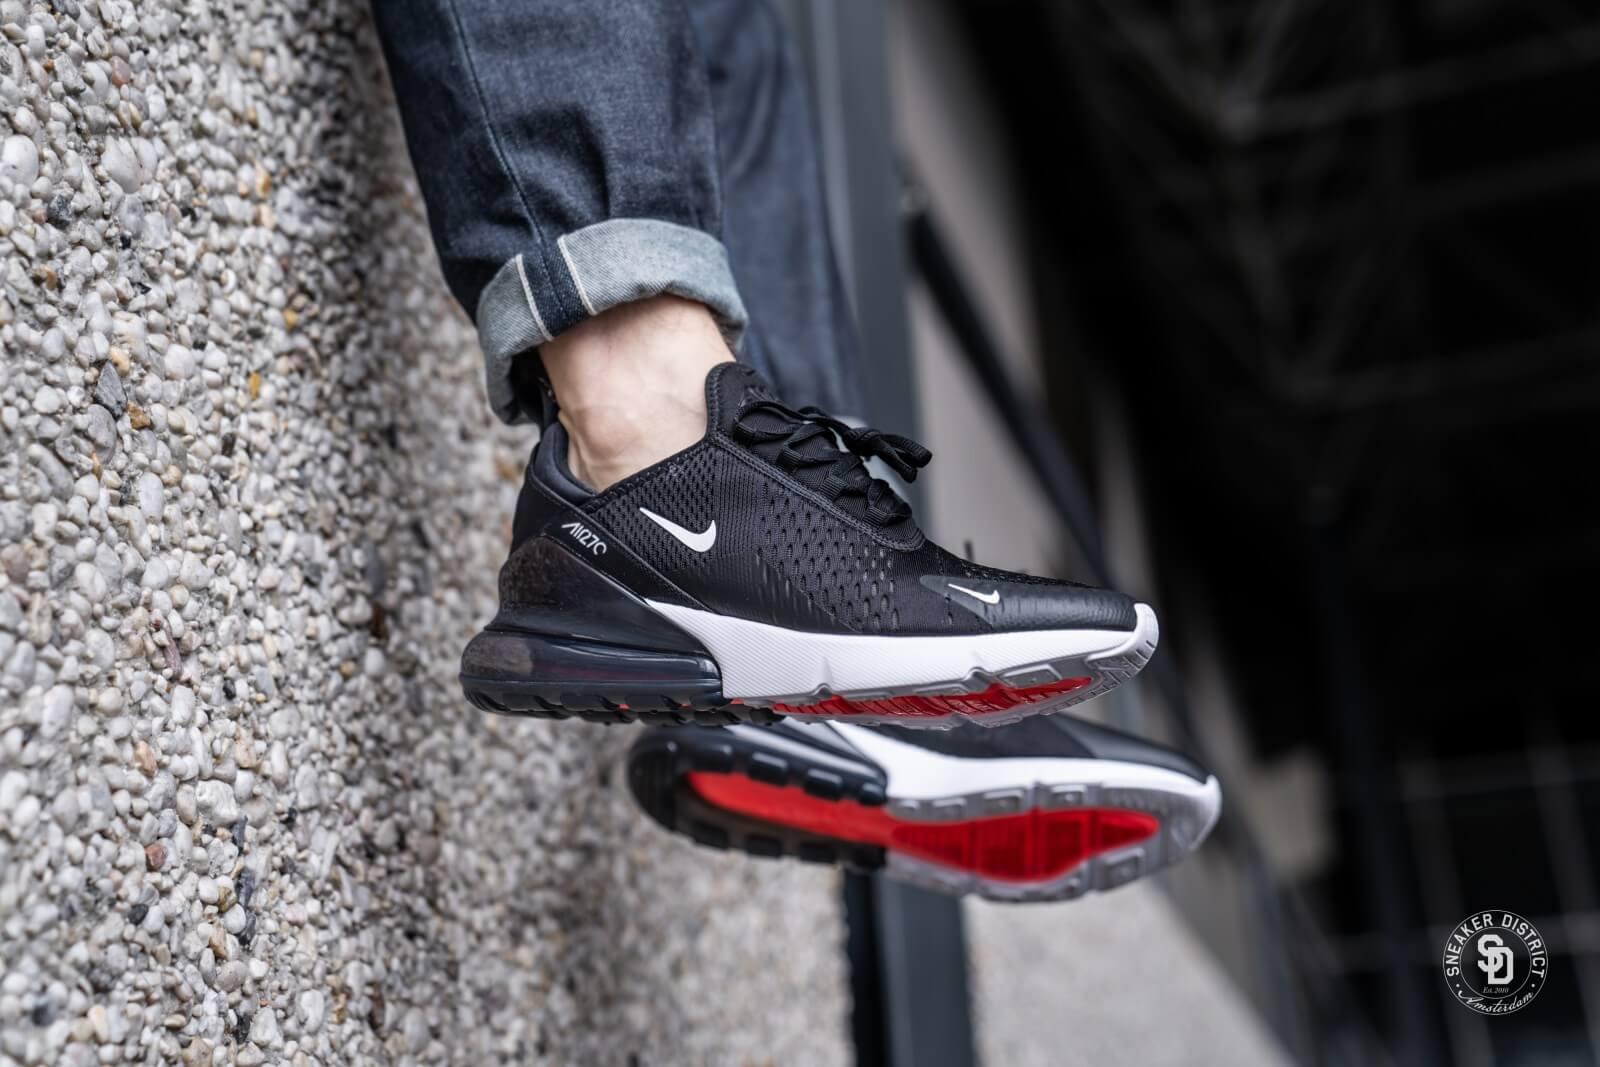 Rabatt Nike Air Max 270 BlackWhite Rabatt bekommen 6N2QIBx0